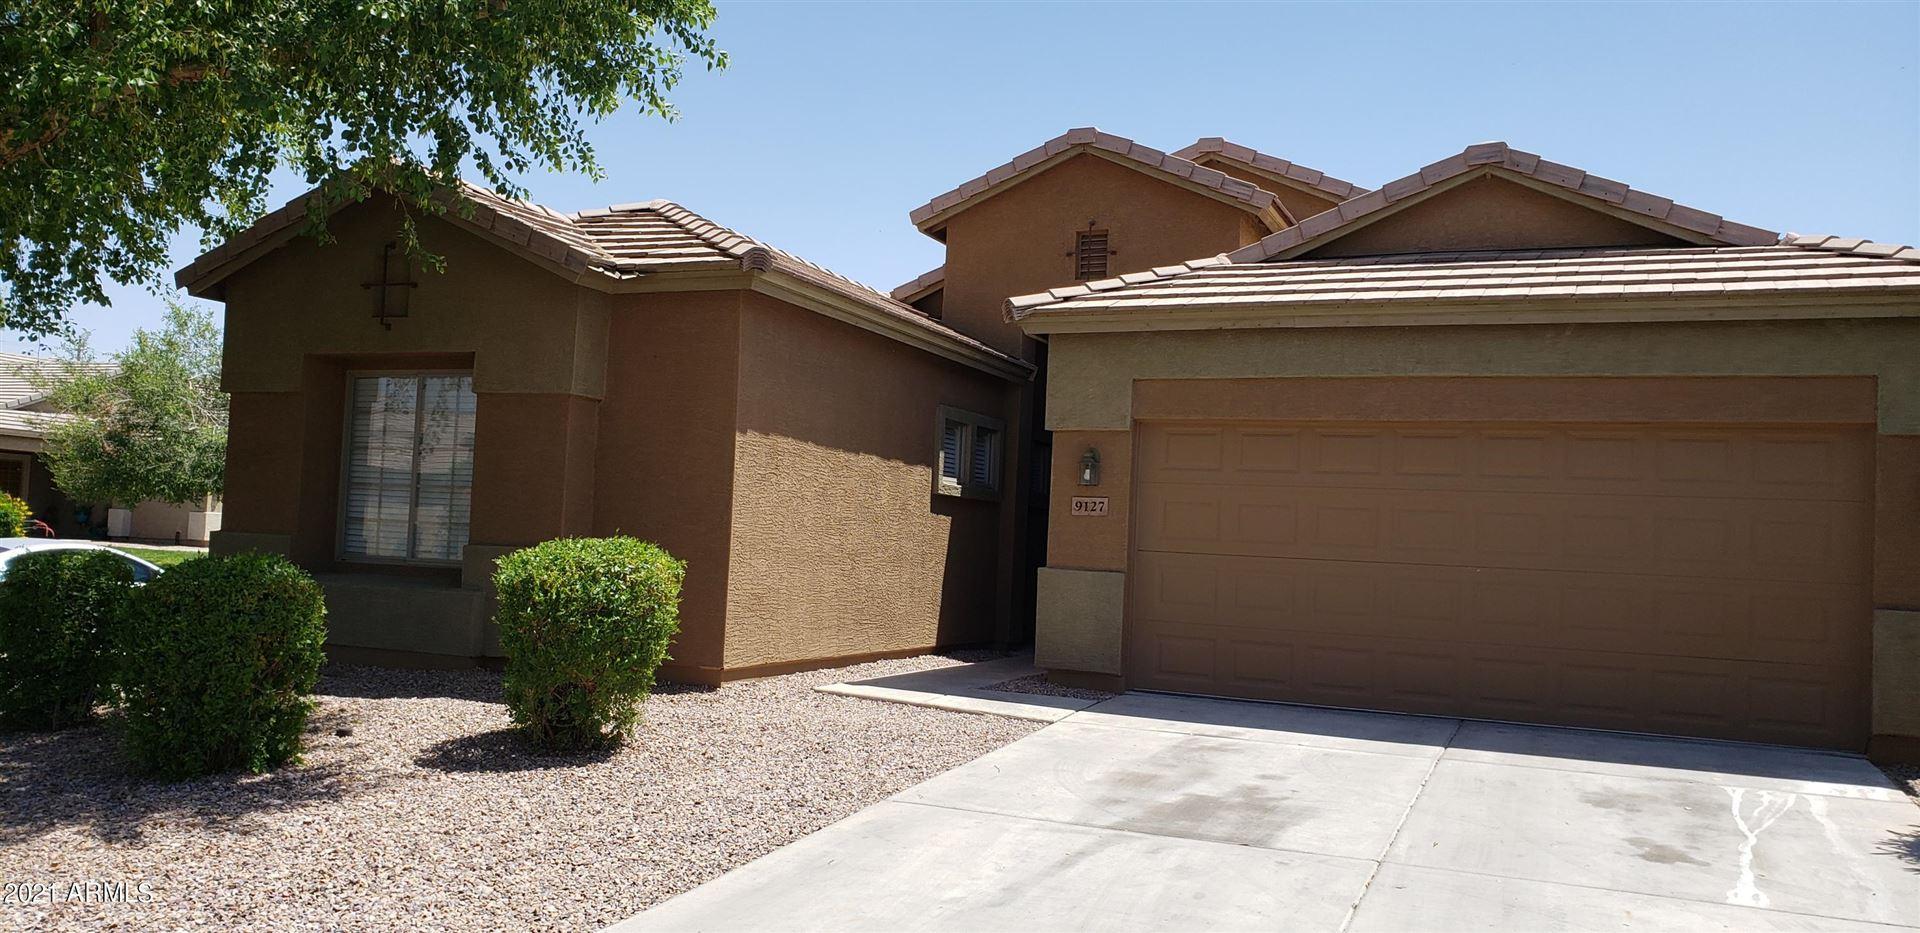 9127 W ELWOOD Street, Tolleson, AZ 85353 - MLS#: 6236457